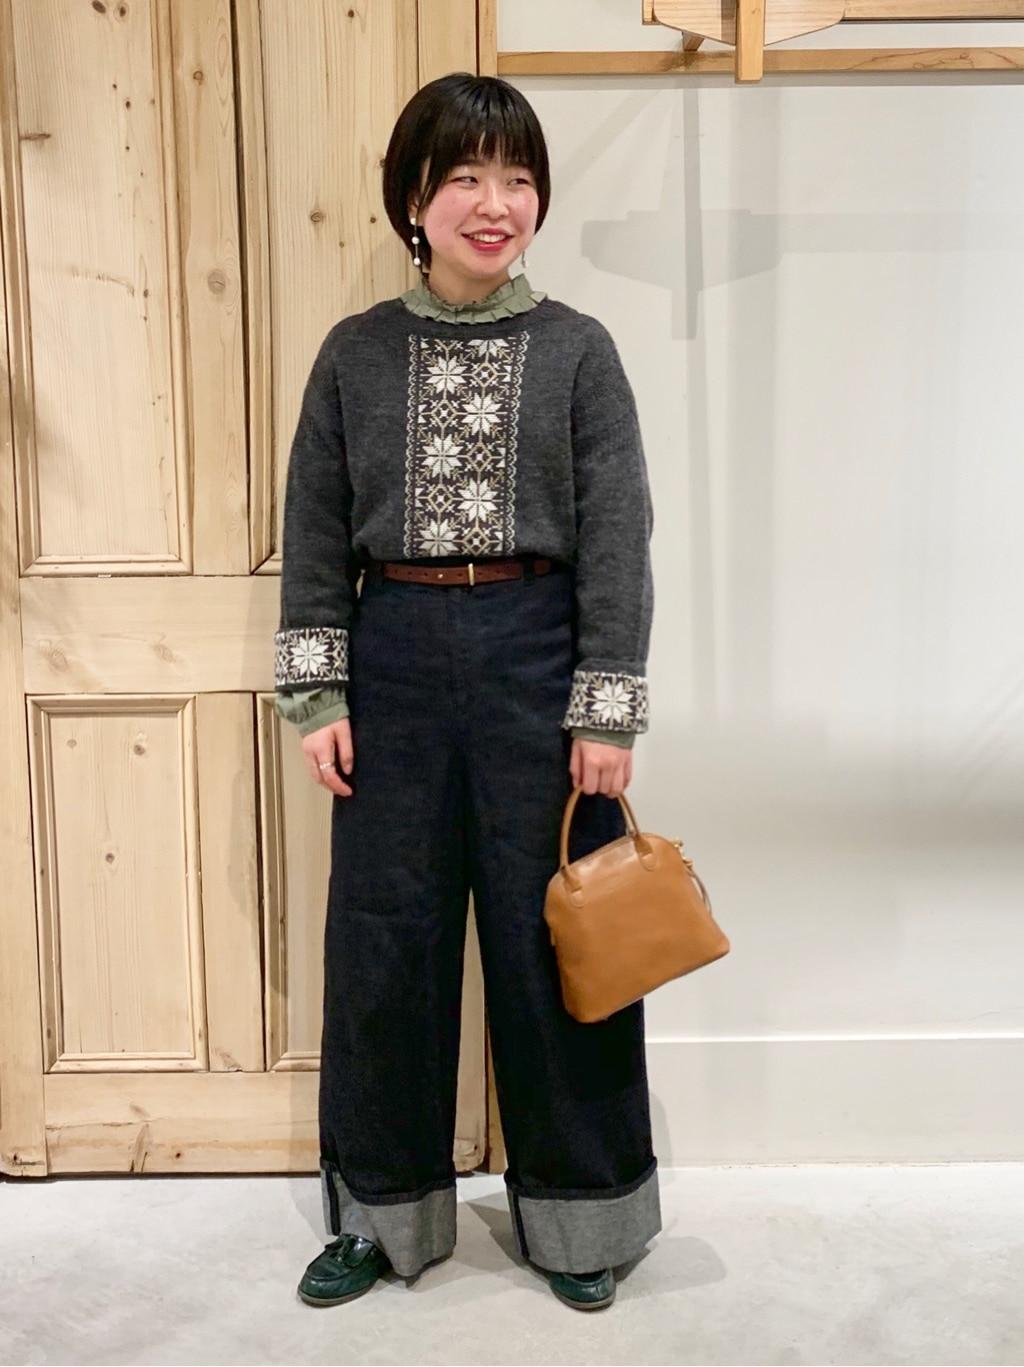 Malle chambre de charme 調布パルコ 身長:153cm 2020.11.11